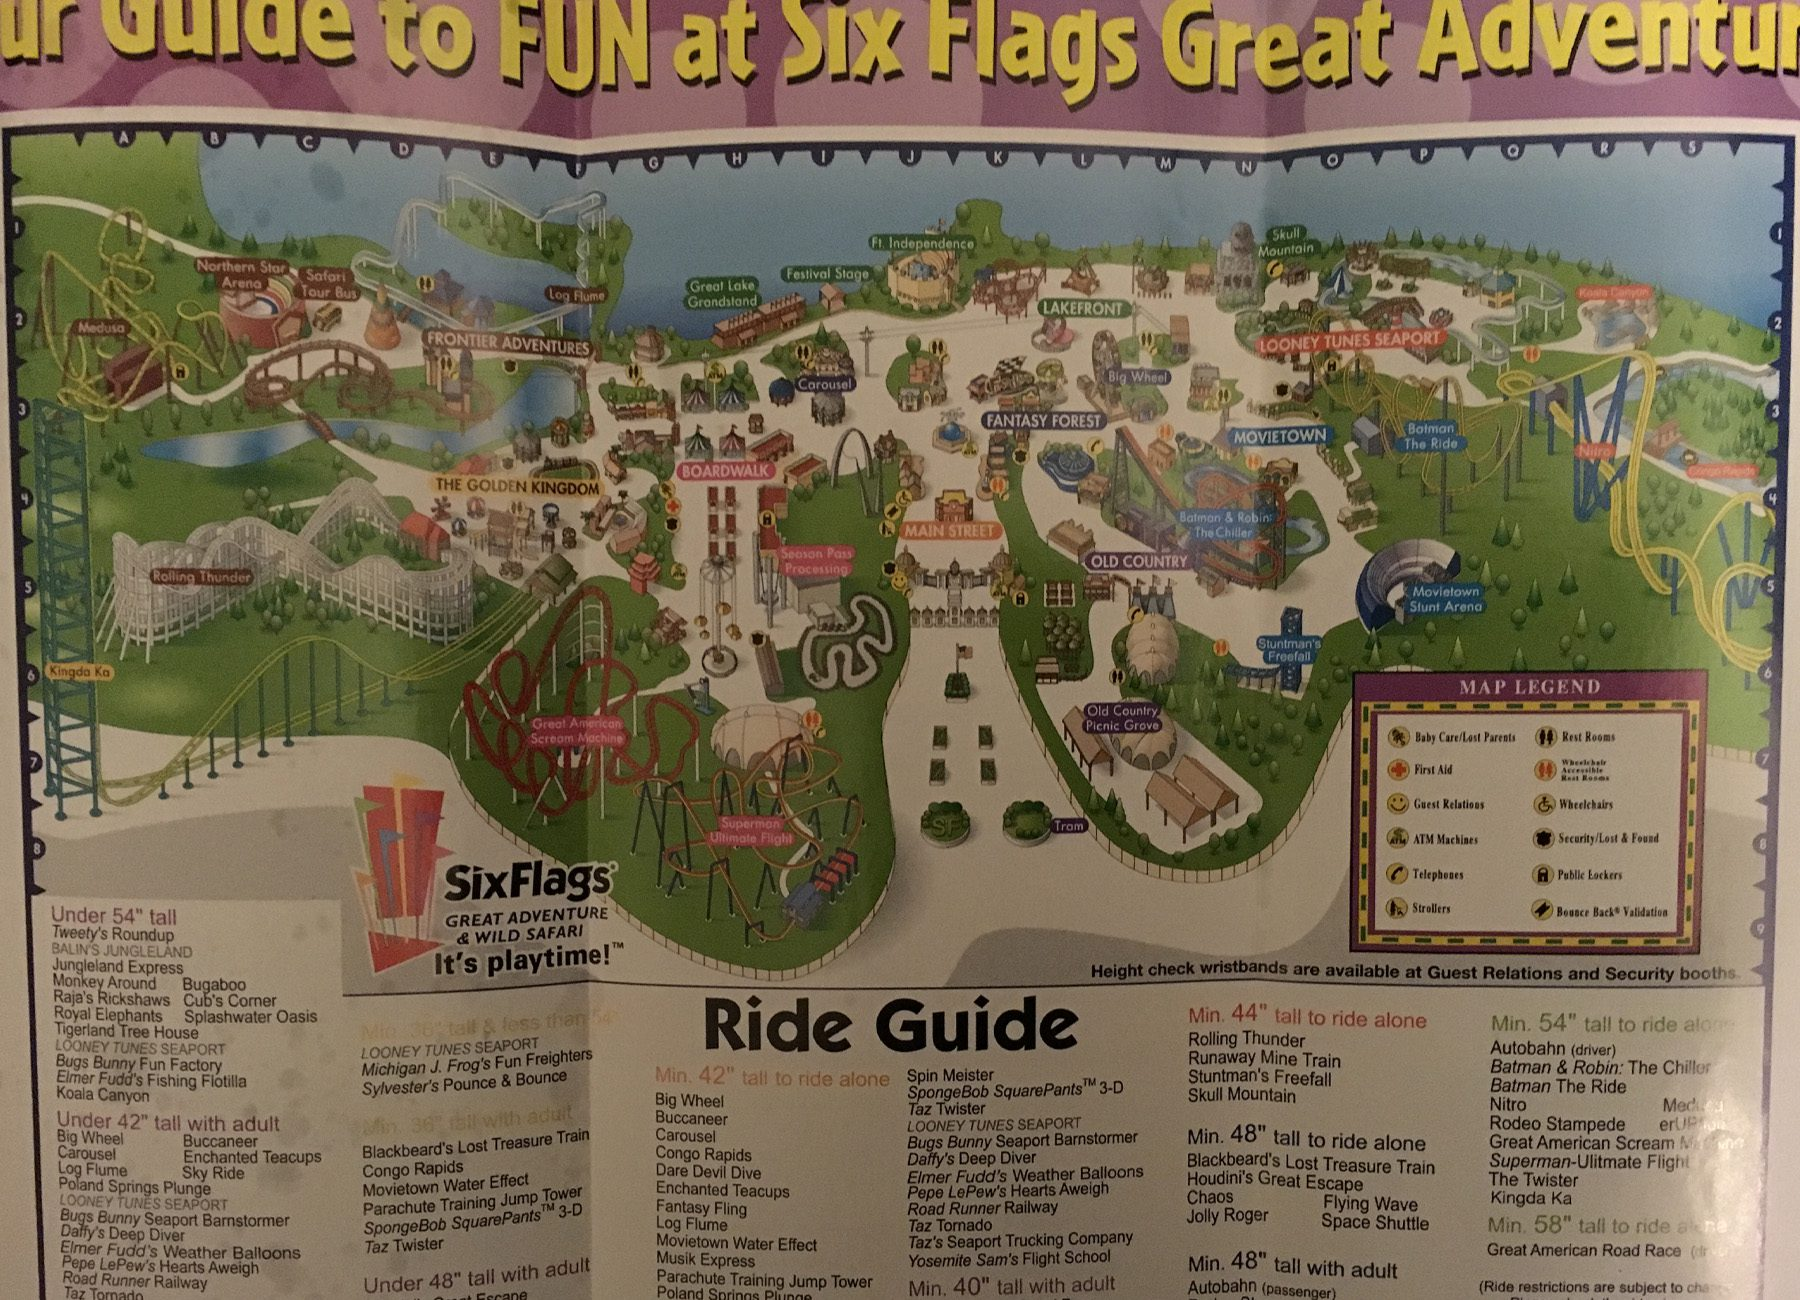 2005 Six Flags Image Jackson